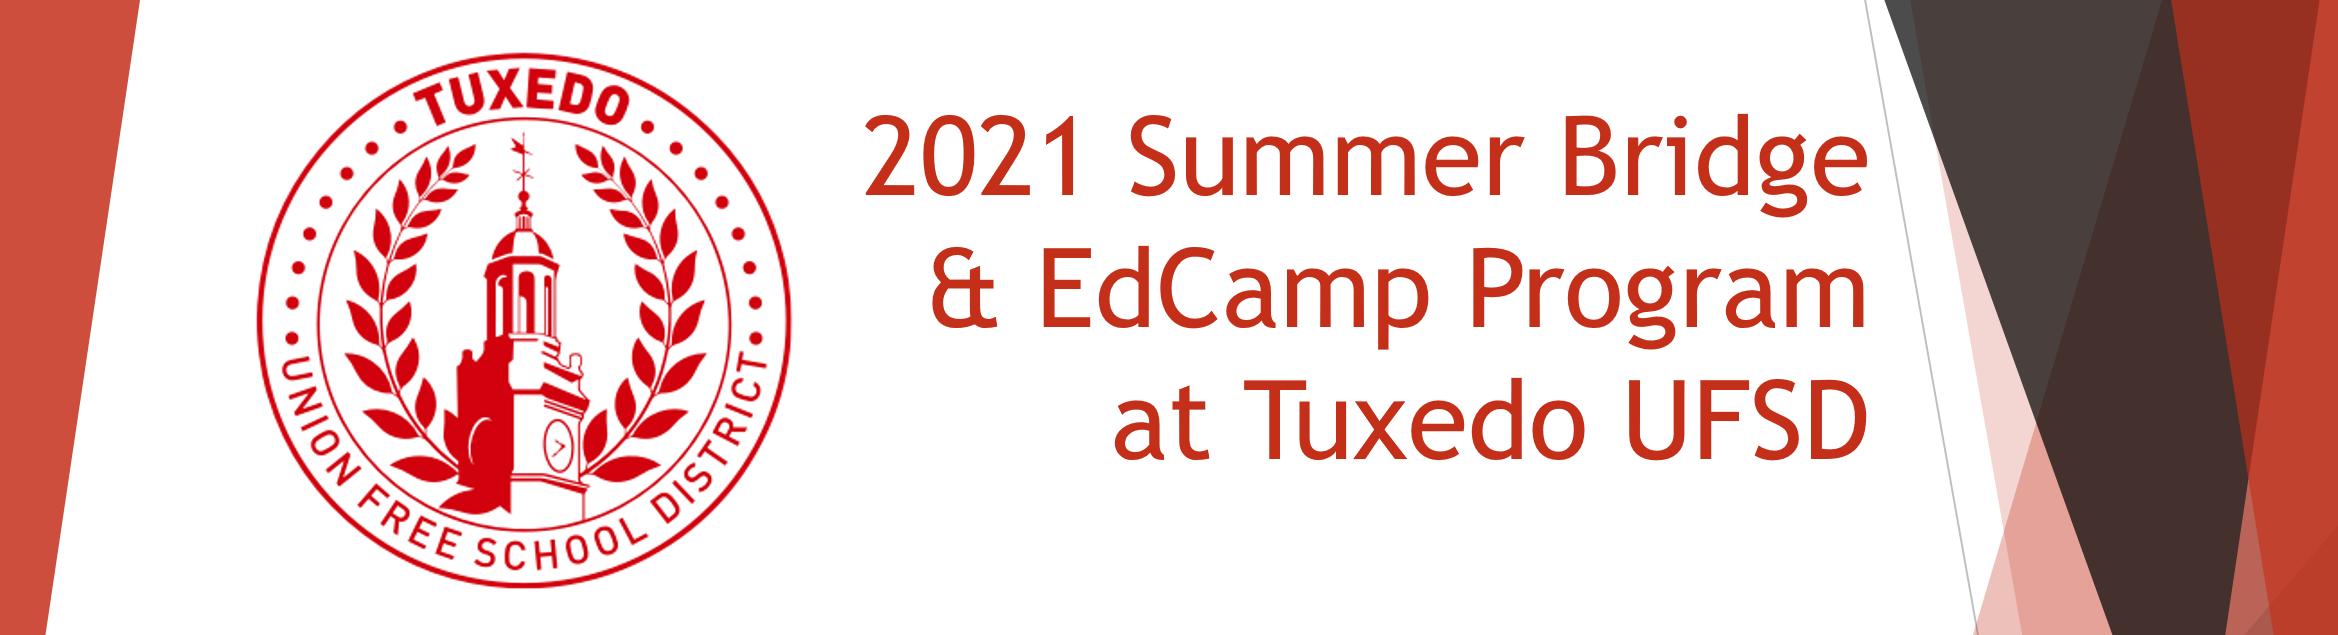 Tuxedo Summer Bridge and EdCamp Program